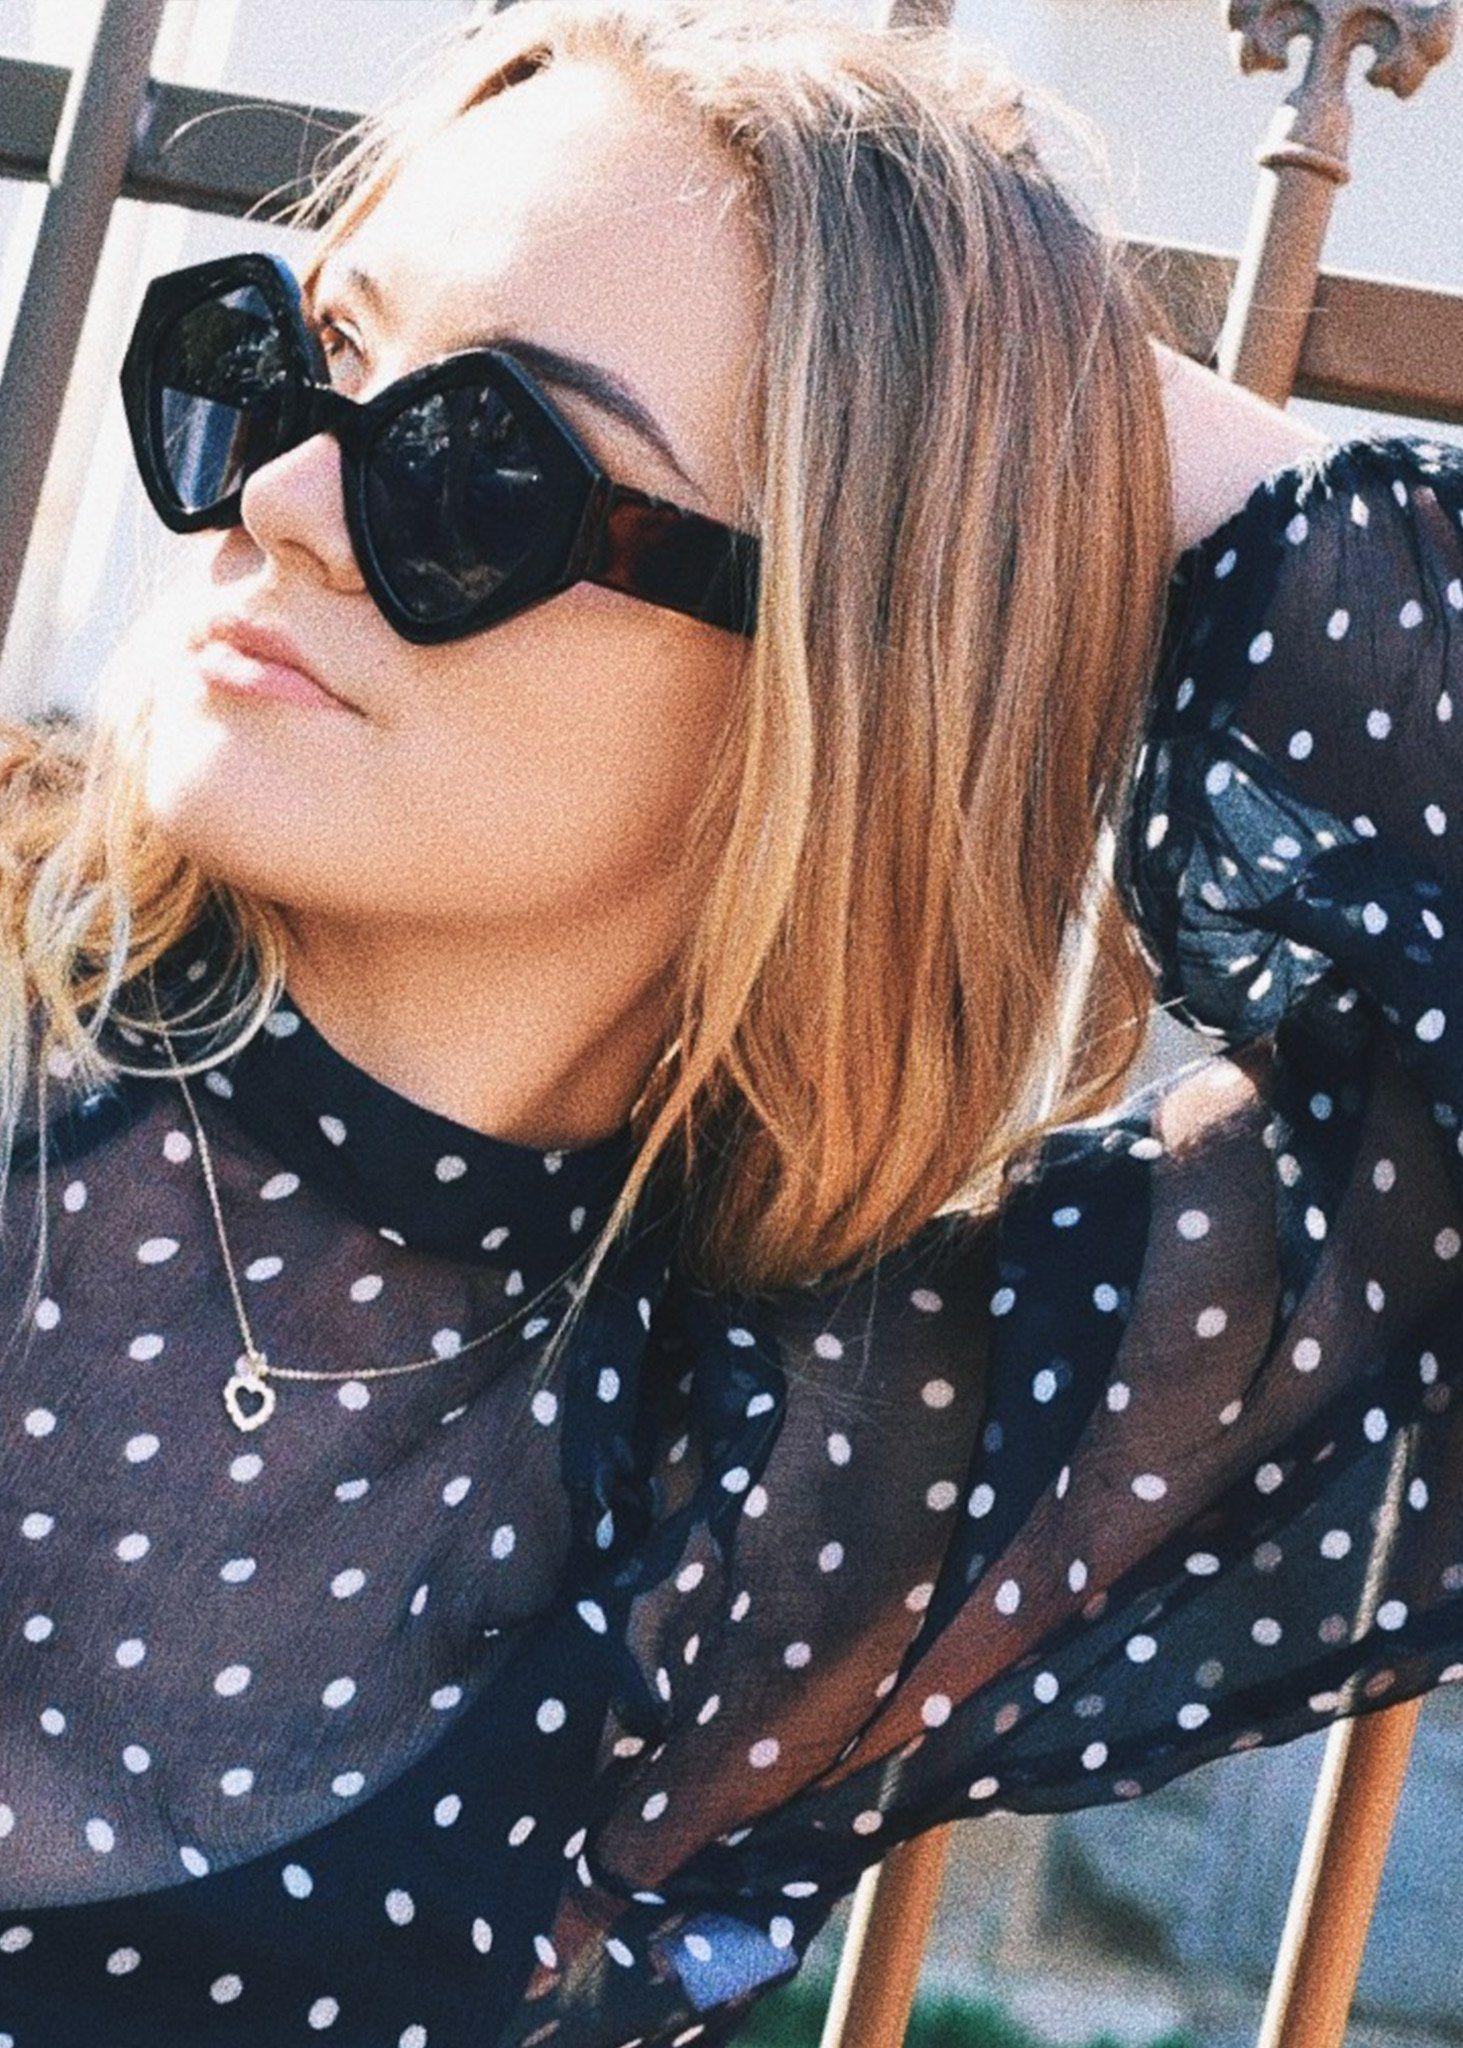 7e6e8b0cf7 Romeo   Juliet Sunglasses in Black by Pared Eyewear at Dead Pretty ...